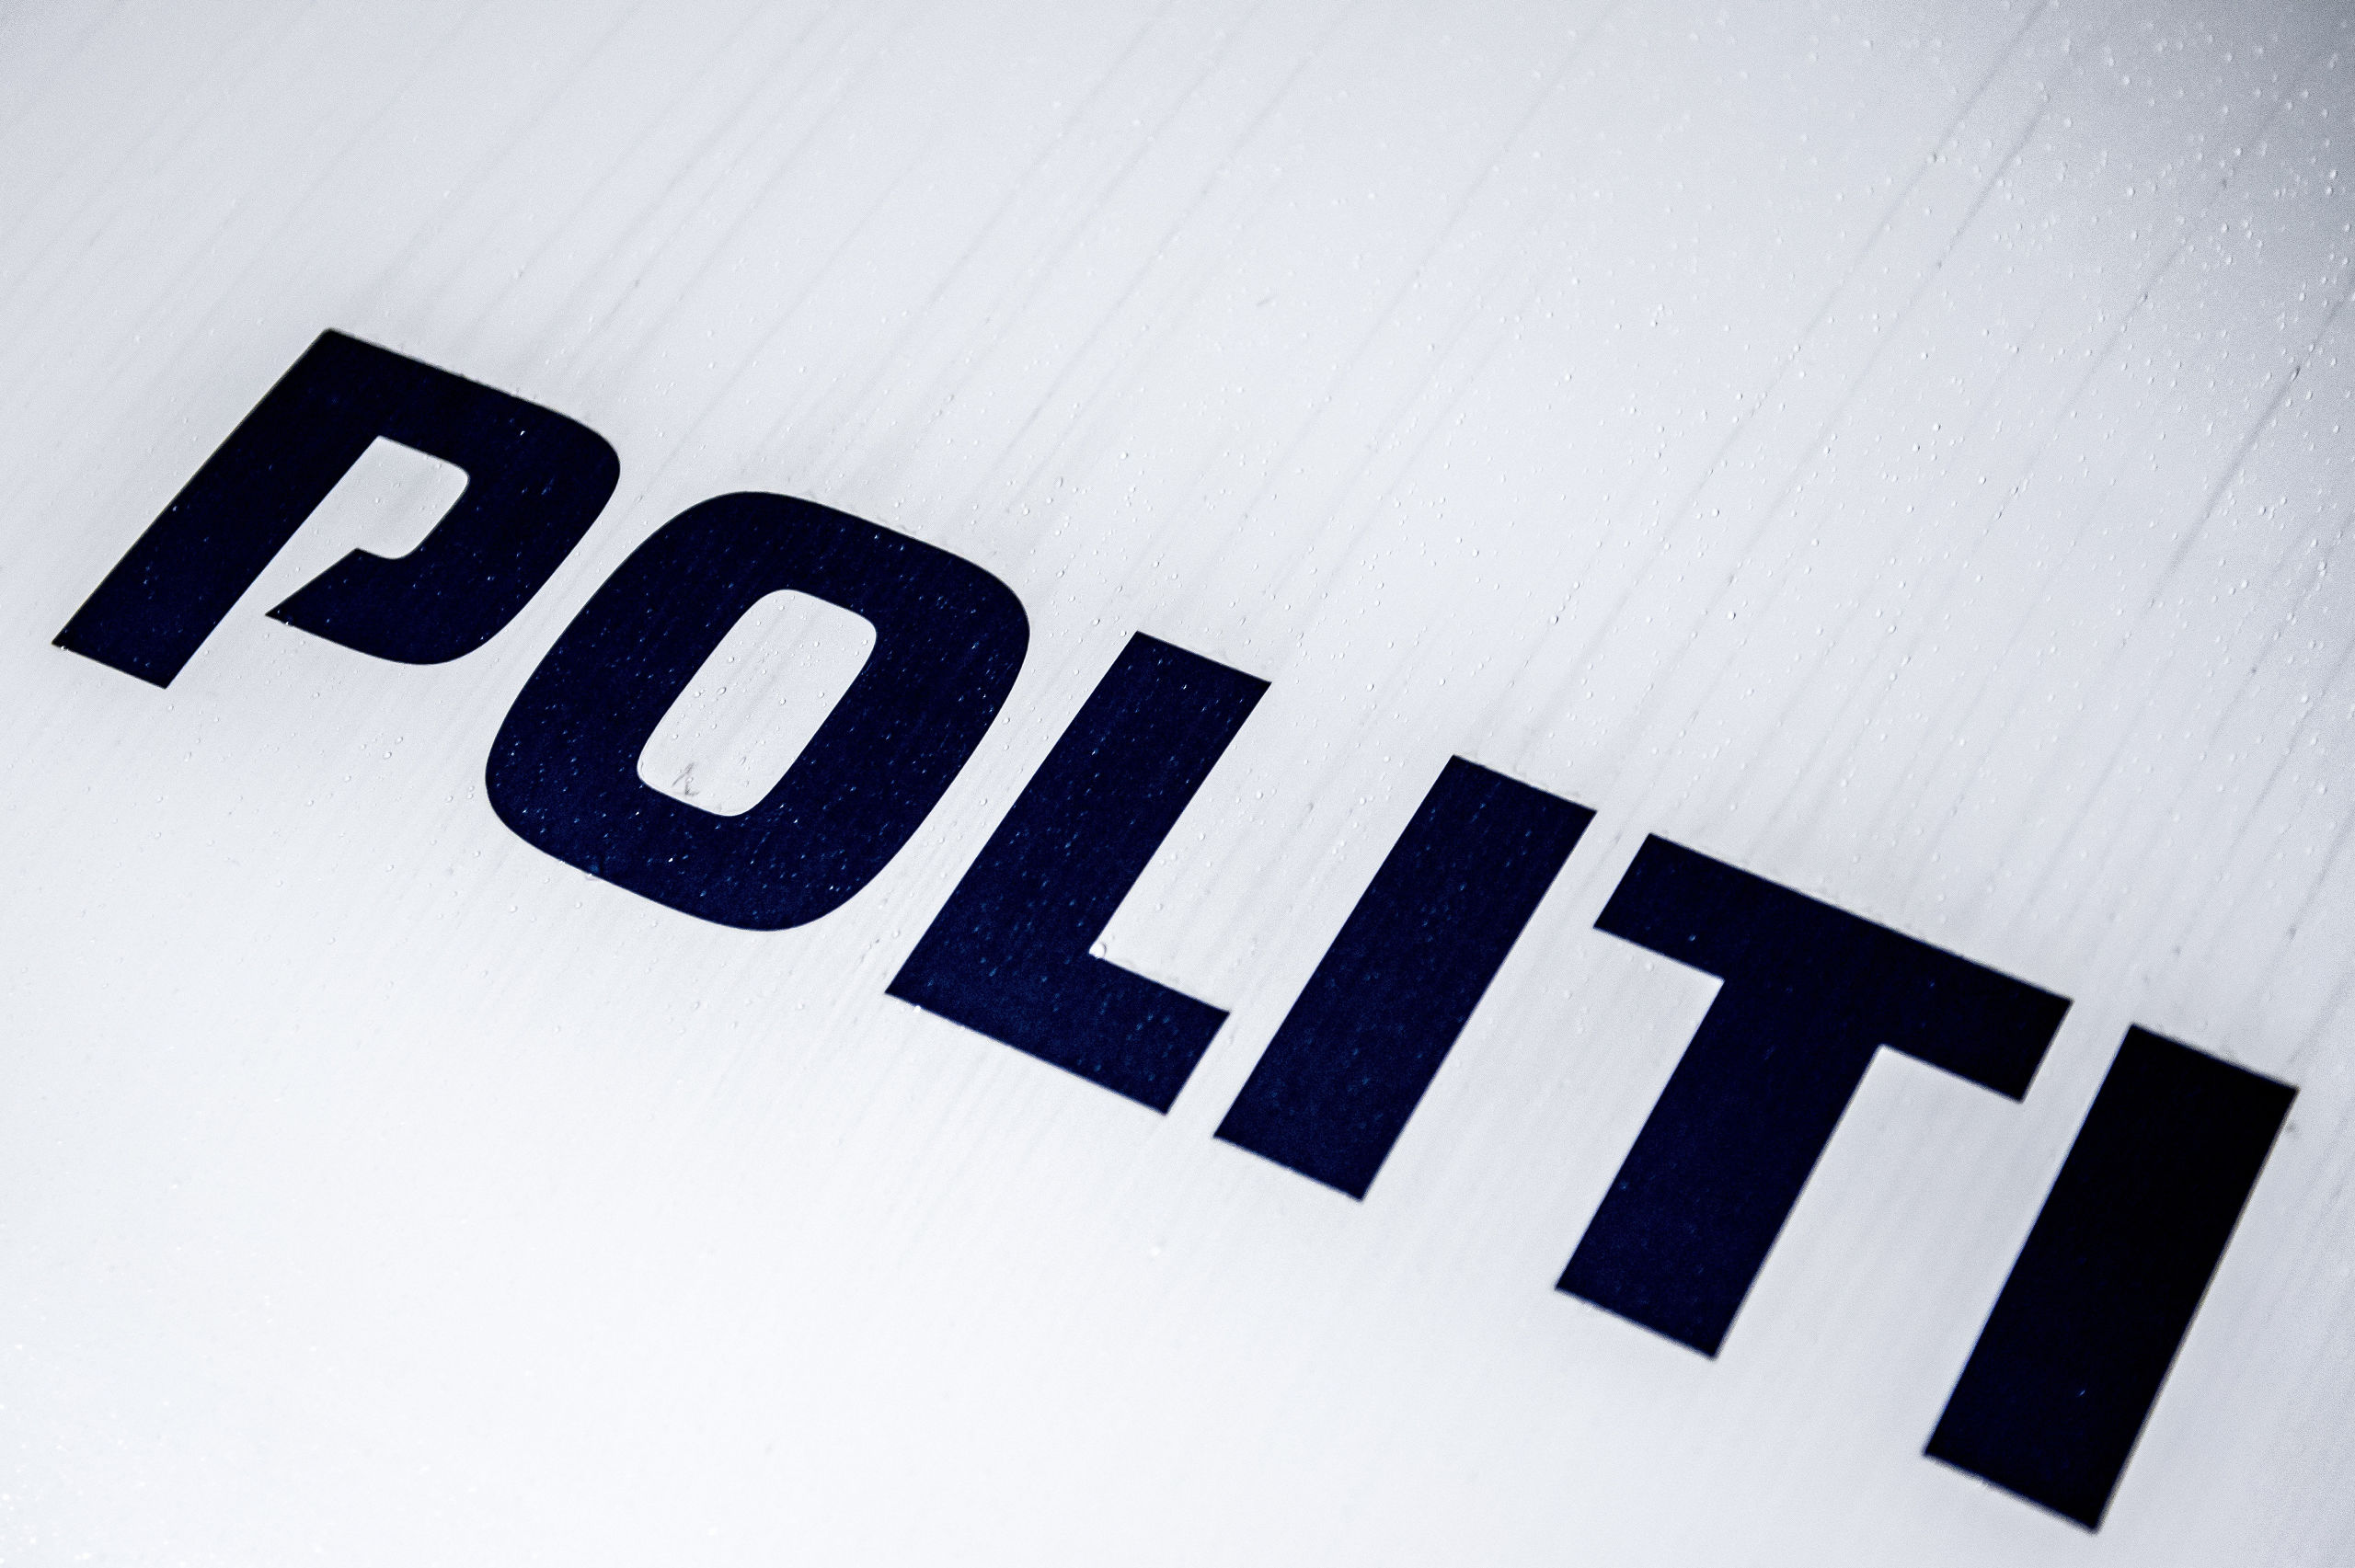 Politiet viser